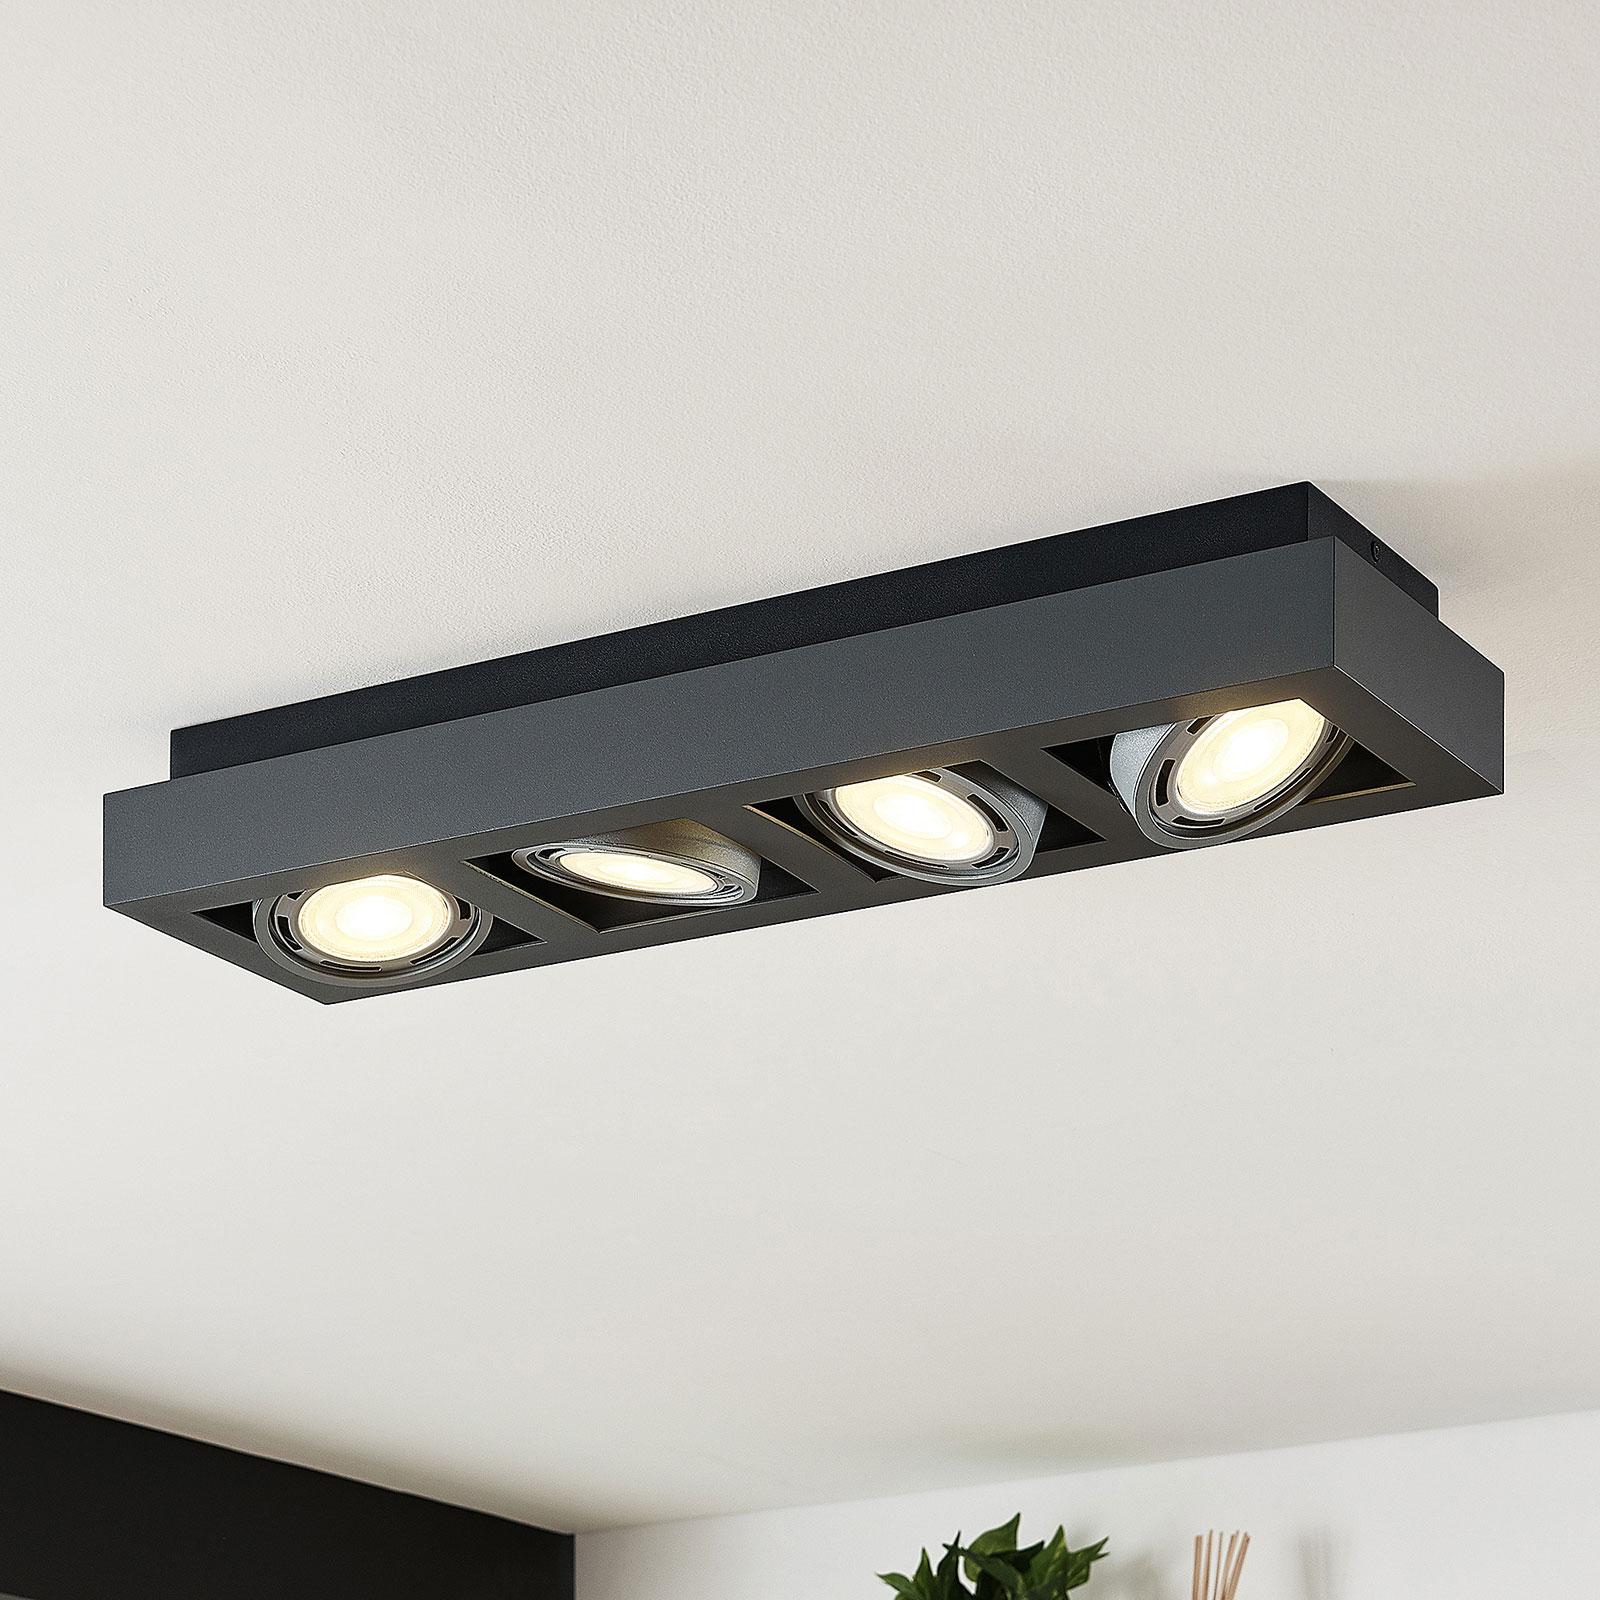 Spot plafond LED Ronka, 4lampes, allongé, gris